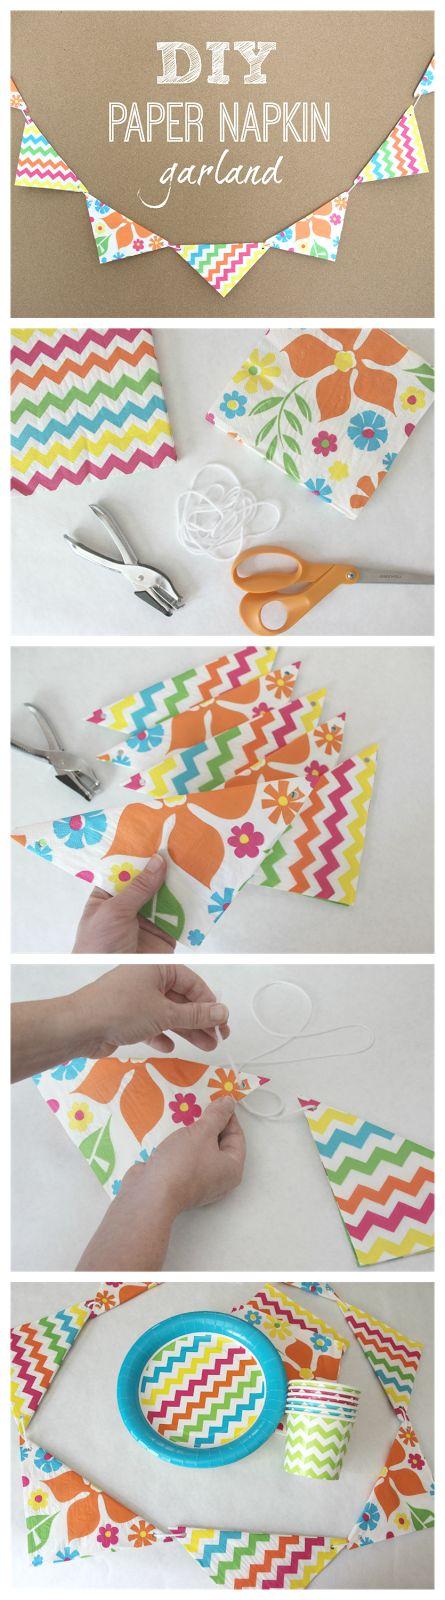 DIY Paper Napkin Garland #partydecor #garland #crafts #decorations #partydecorations #napkingarland #inexpensivepartydecorations #easy #DIY